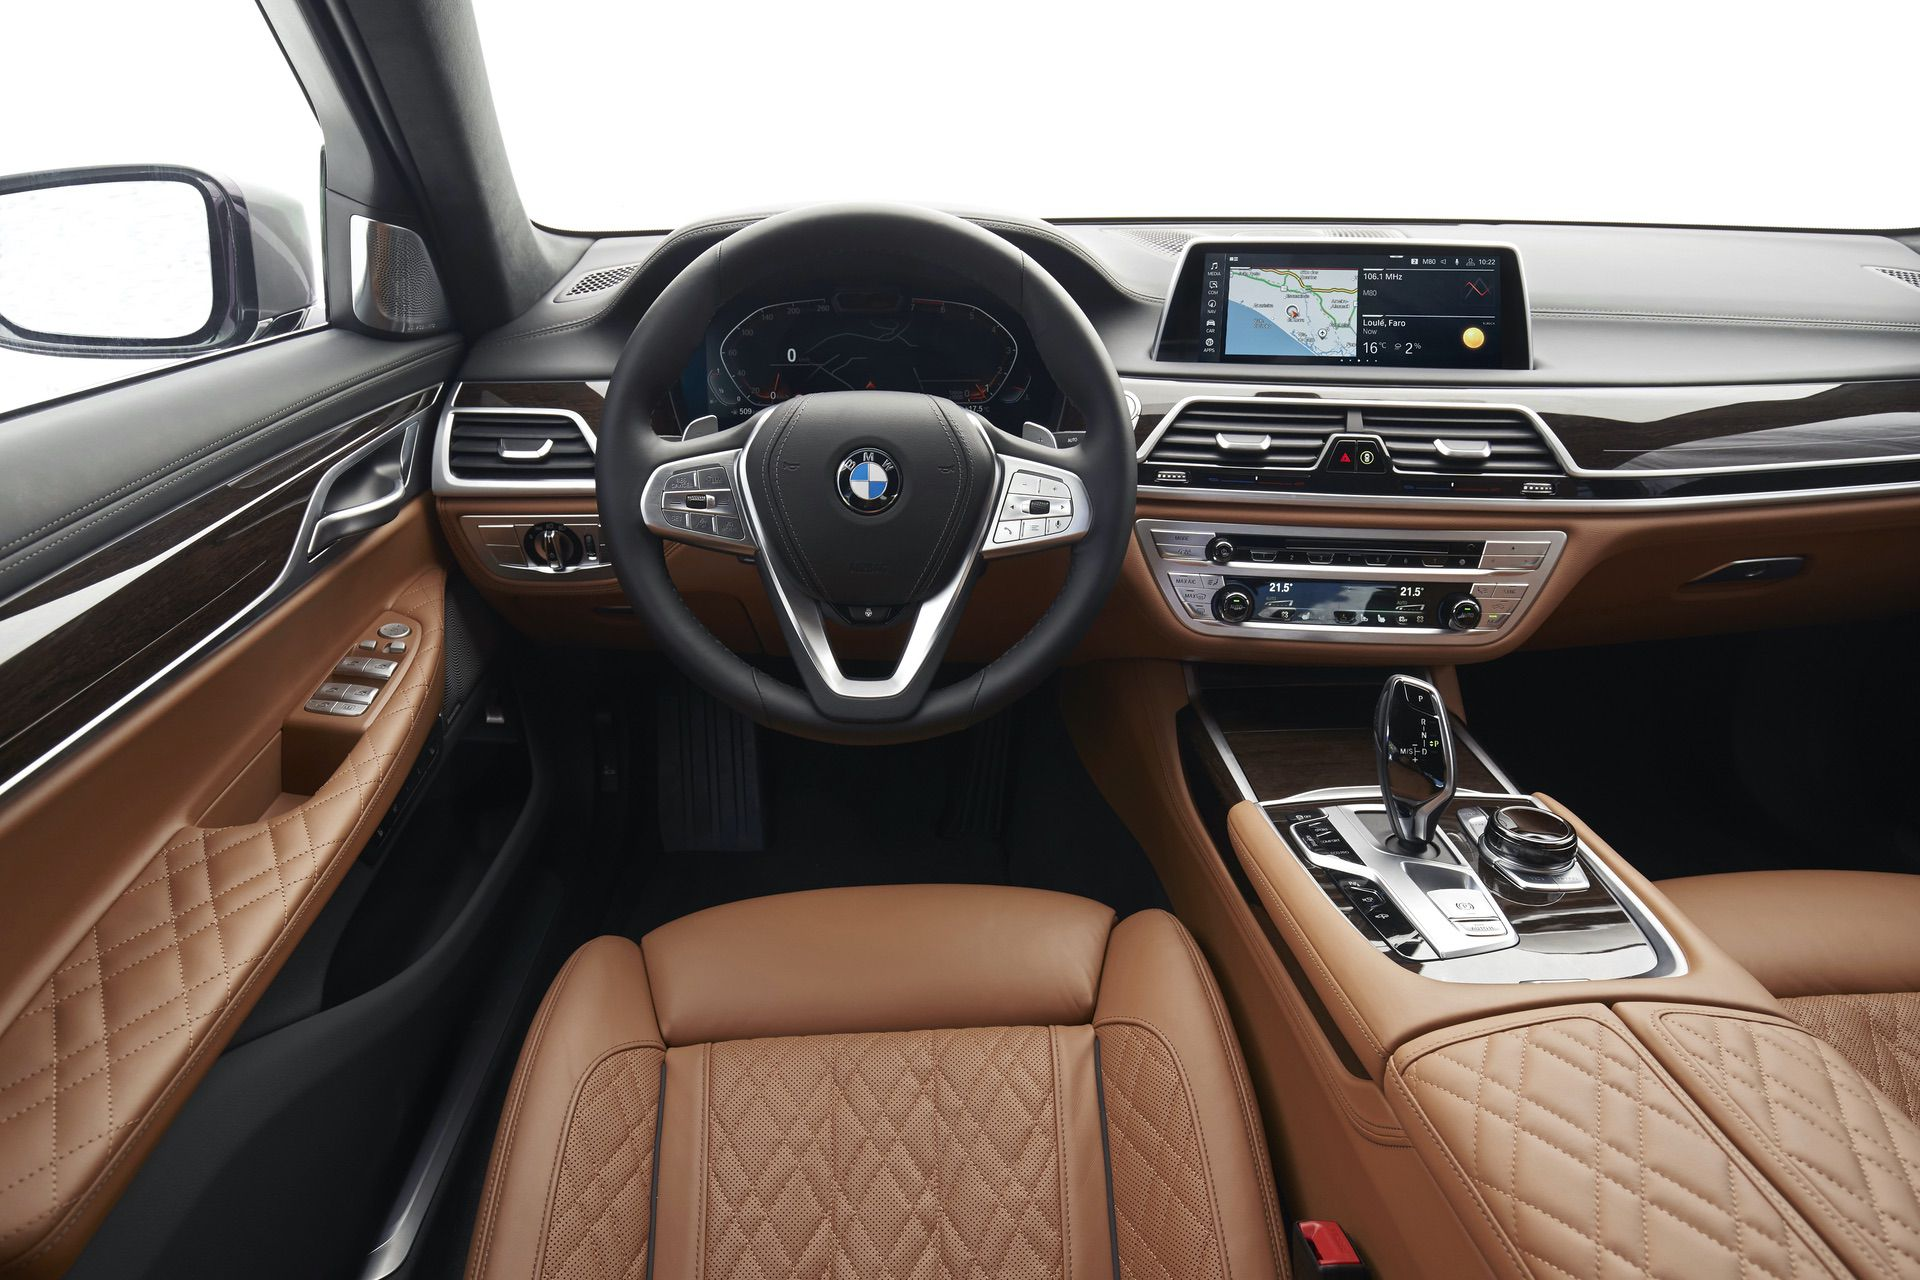 Test Drive 2019 Bmw 750li Xdrive A Promising Reboot Of The Luxury